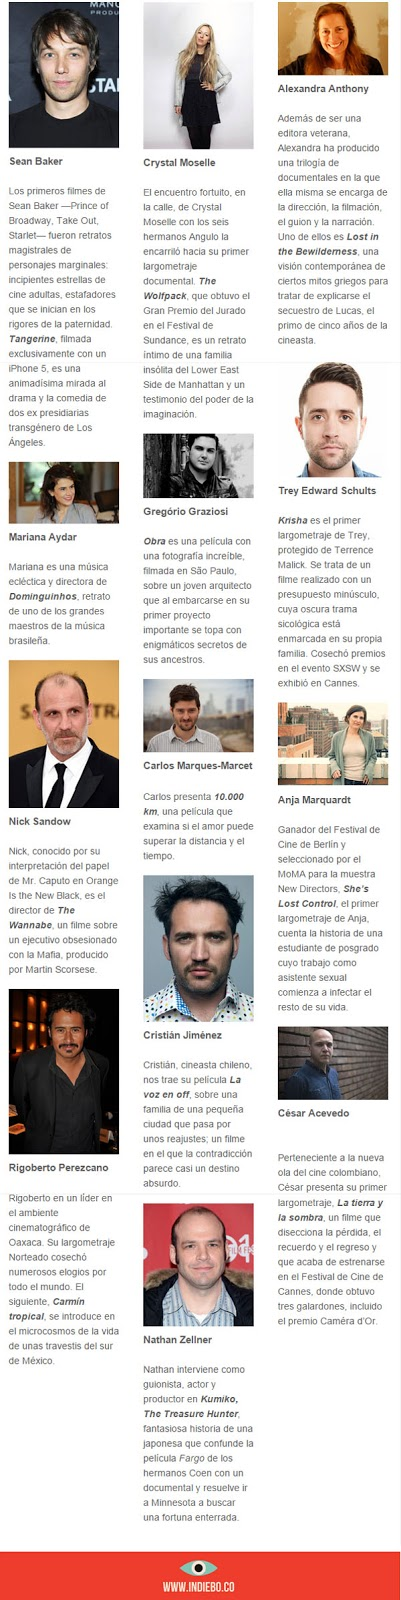 invitados-IndieBo-2015-presentarán-estrenos-películas-Latinoamérica